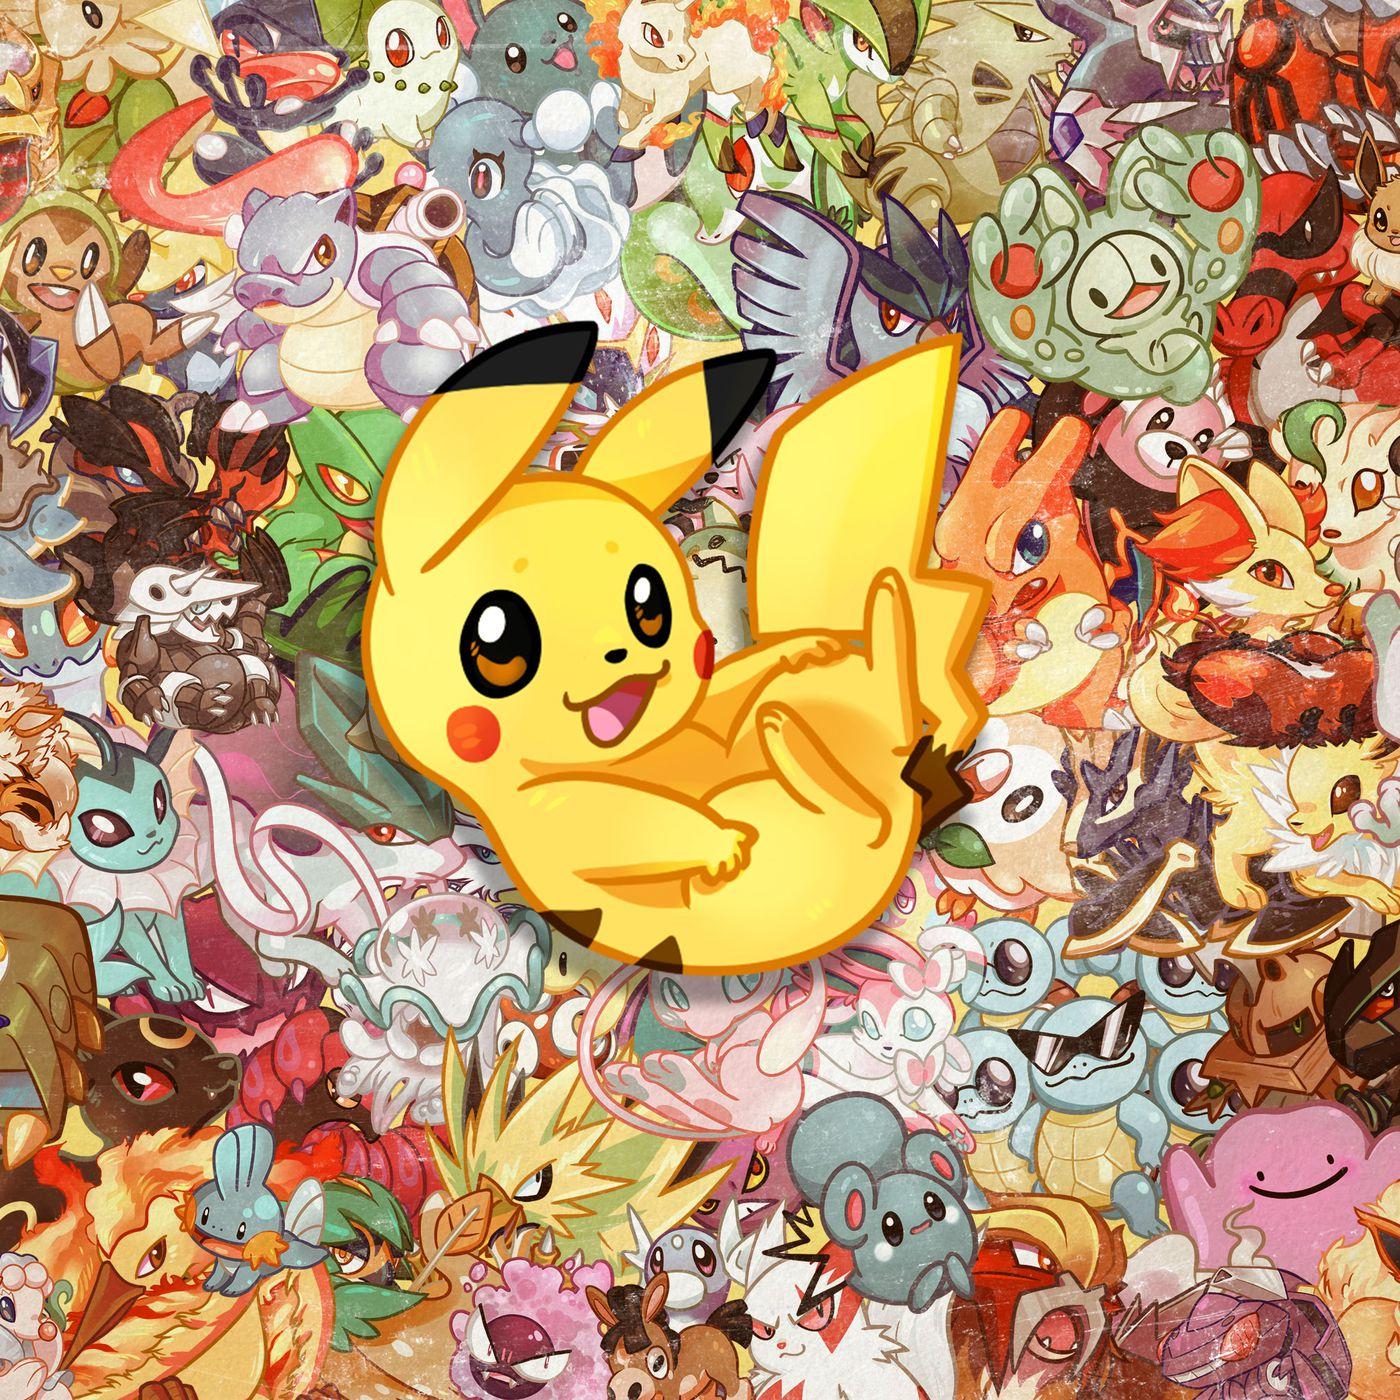 detective pikachu ditto human